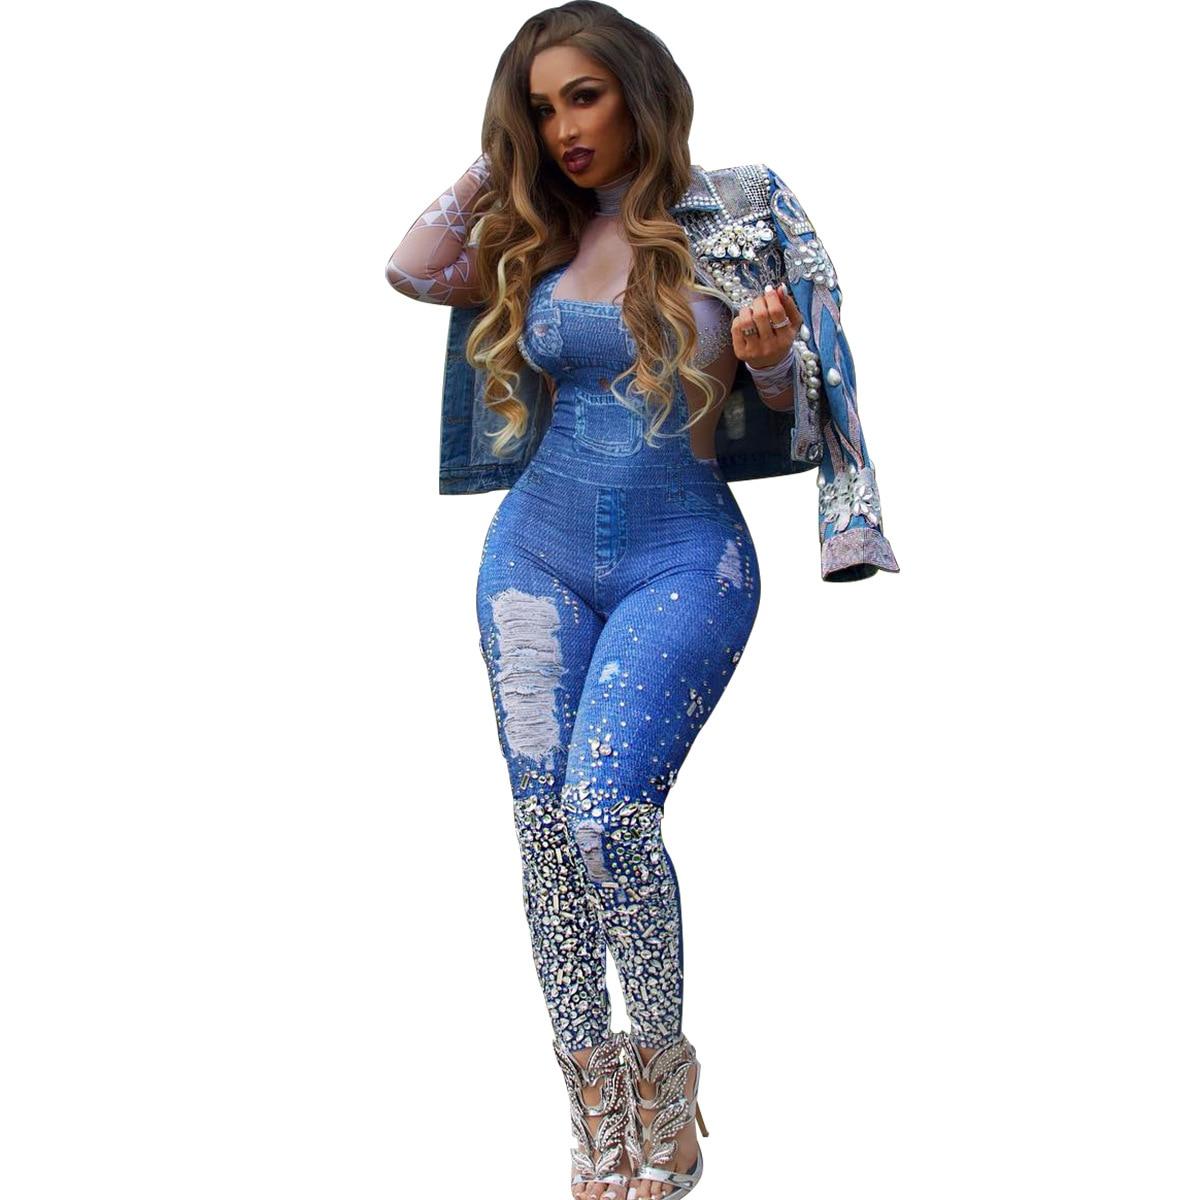 a0725e2668 2019 Fashion Cowboy Bib Pants Printing Jumpsuit Women Slim Casual Pants  Denim Rompers Sexy Tights Blue Women Trousers Jumpsuit